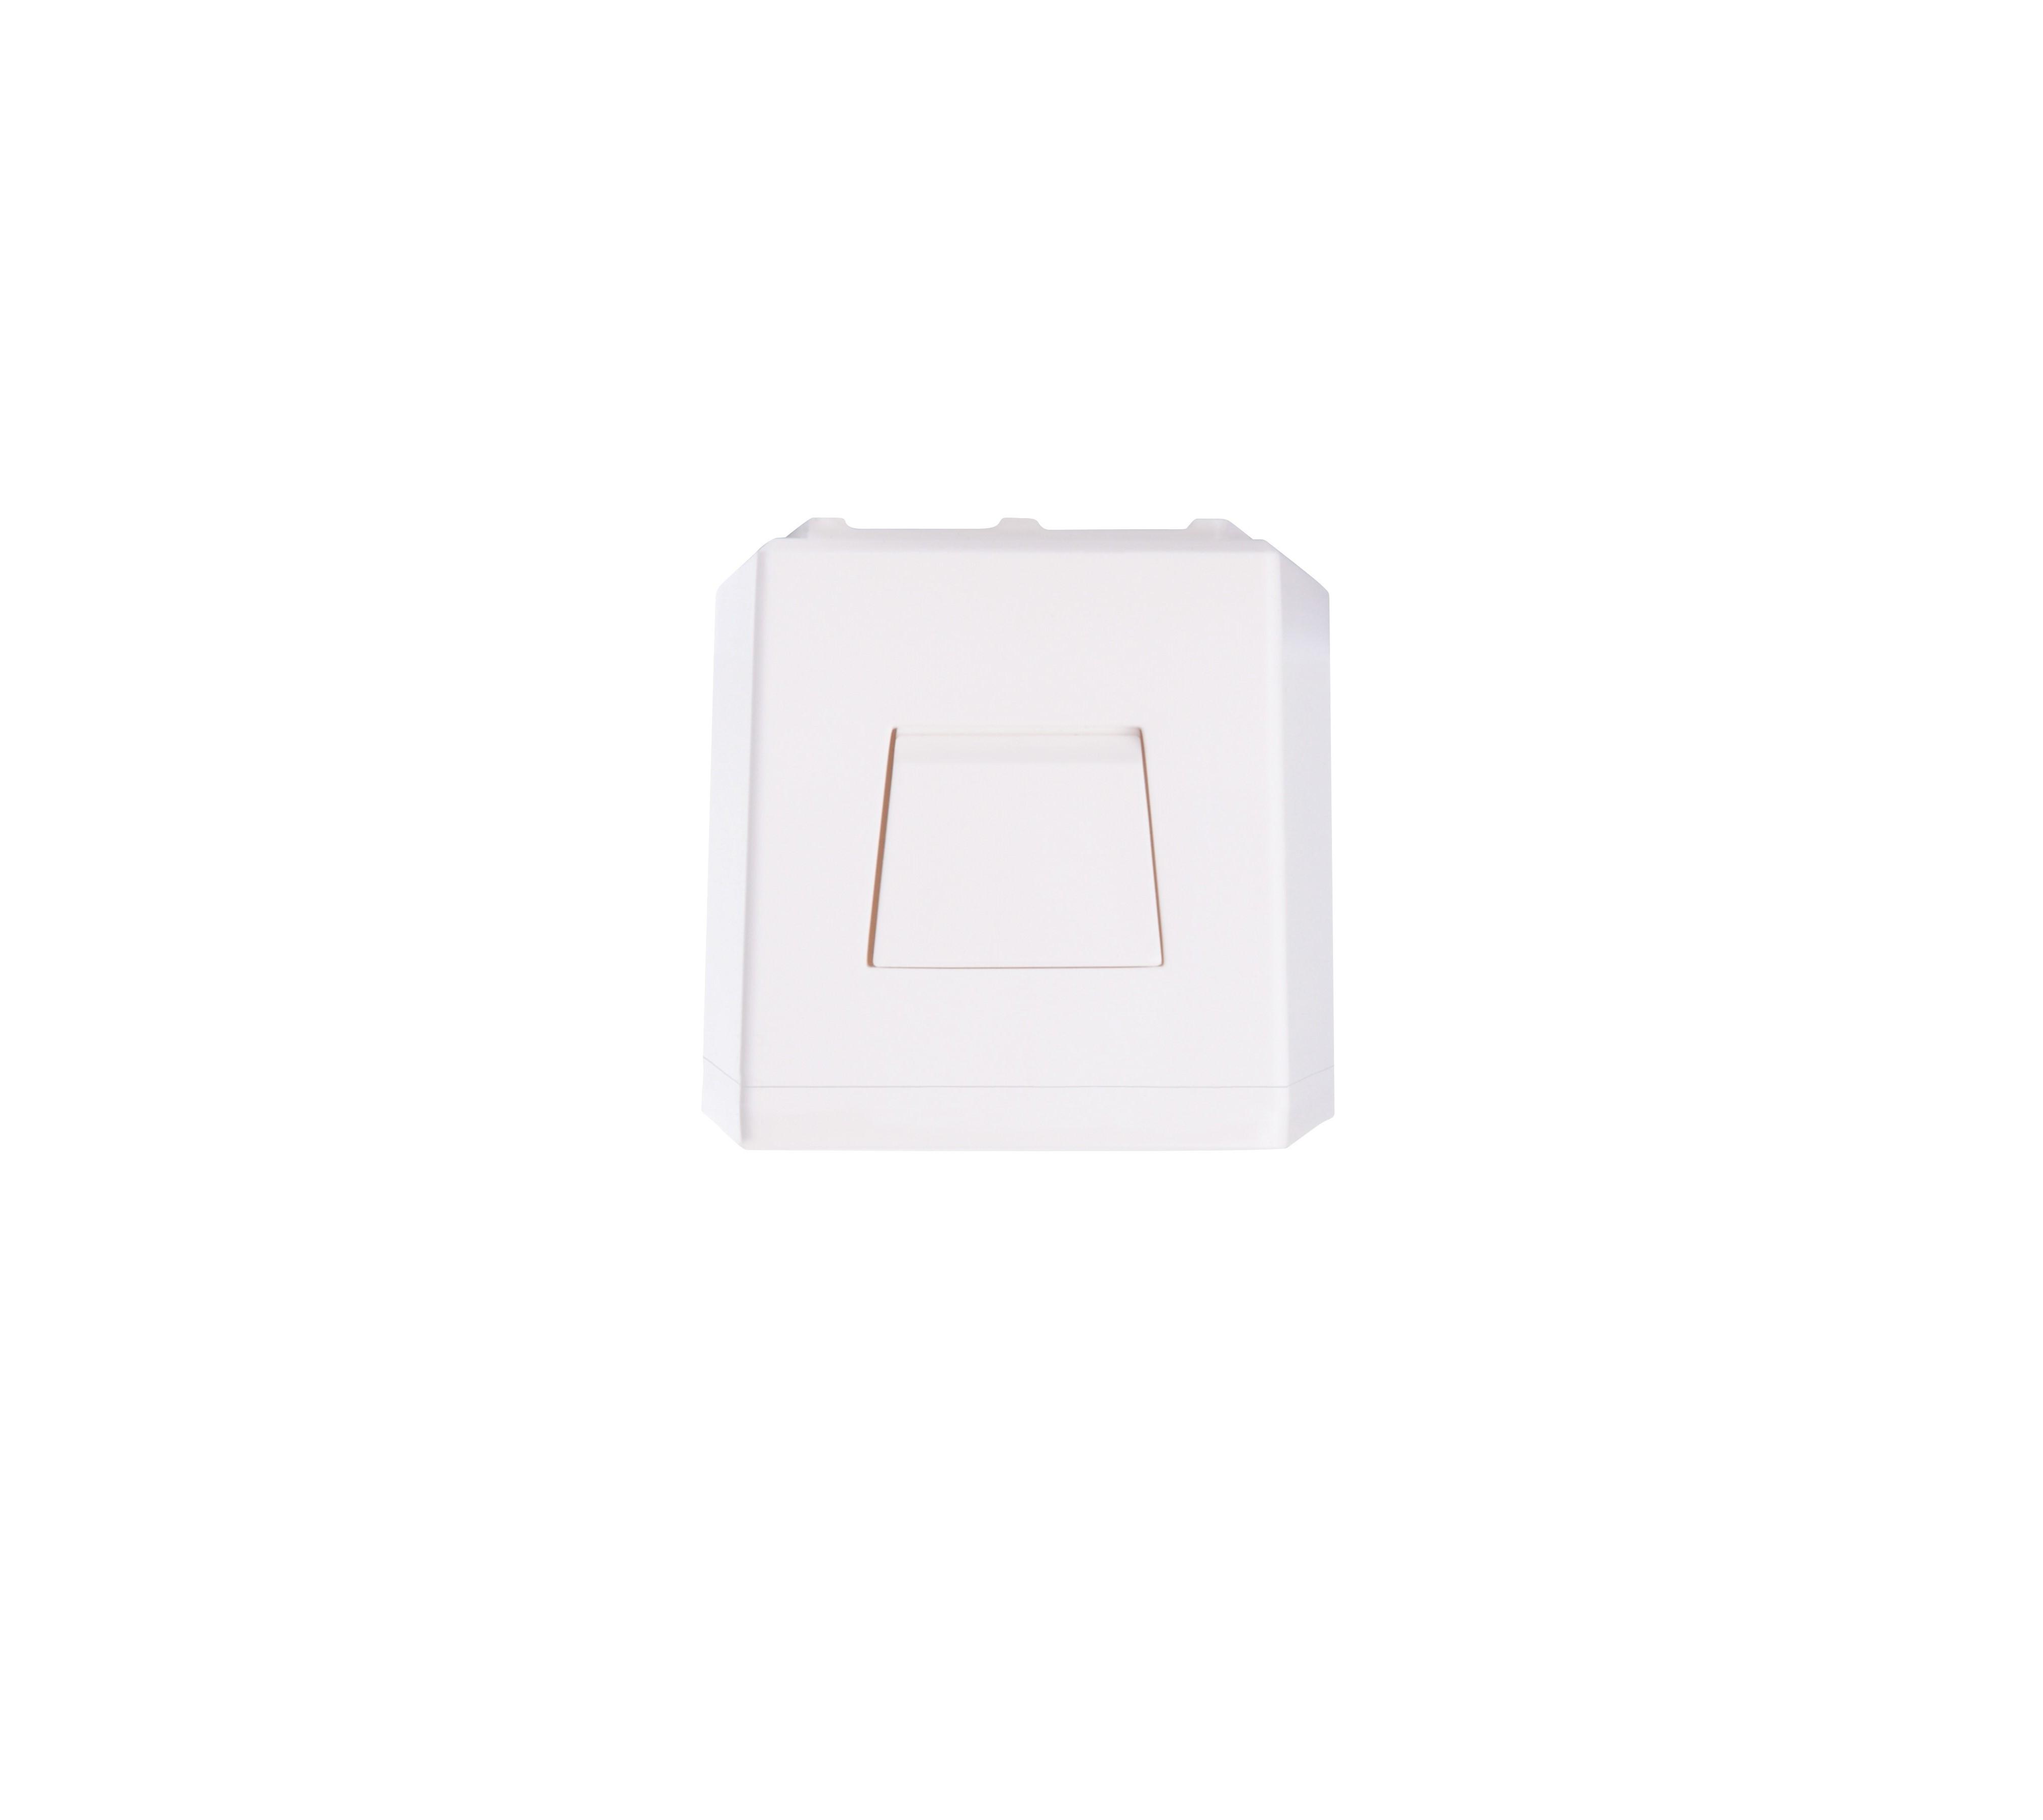 Lampa emergenta led Intelight 94523   3h nementinut test automat 1